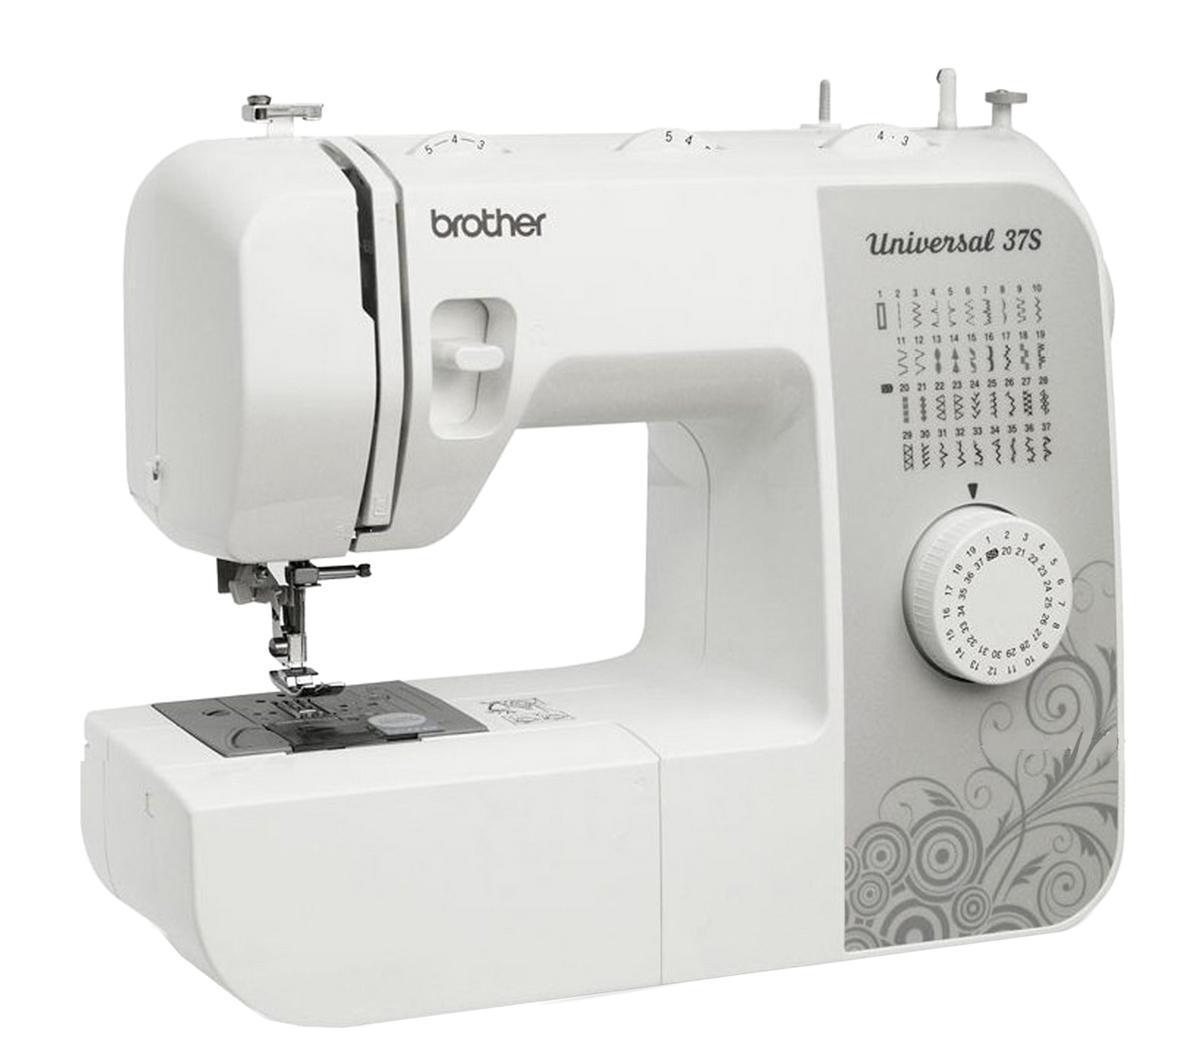 Brother Universal 37S швейная машина761436